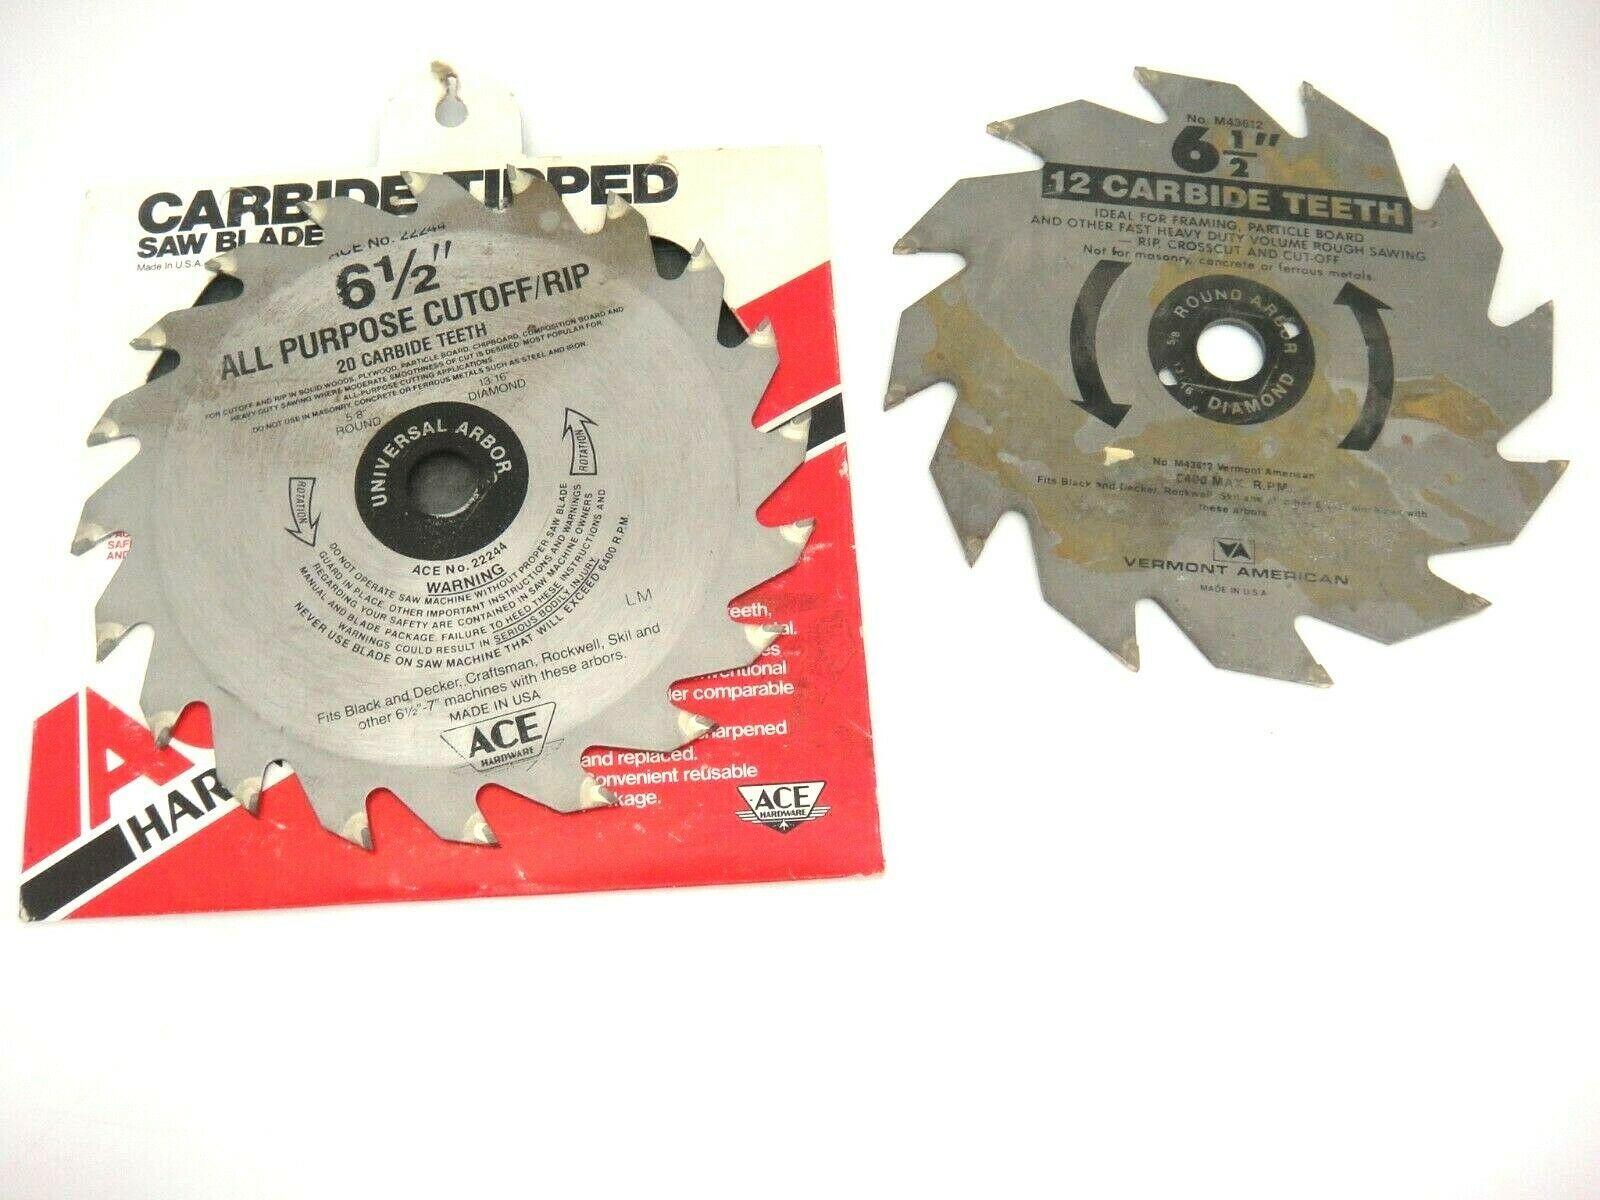 "Circular Saw Blades 6.5"" 1 Ace Hardware 20 Teeth & 1 Vermont American 12 Teeth - $9.40"